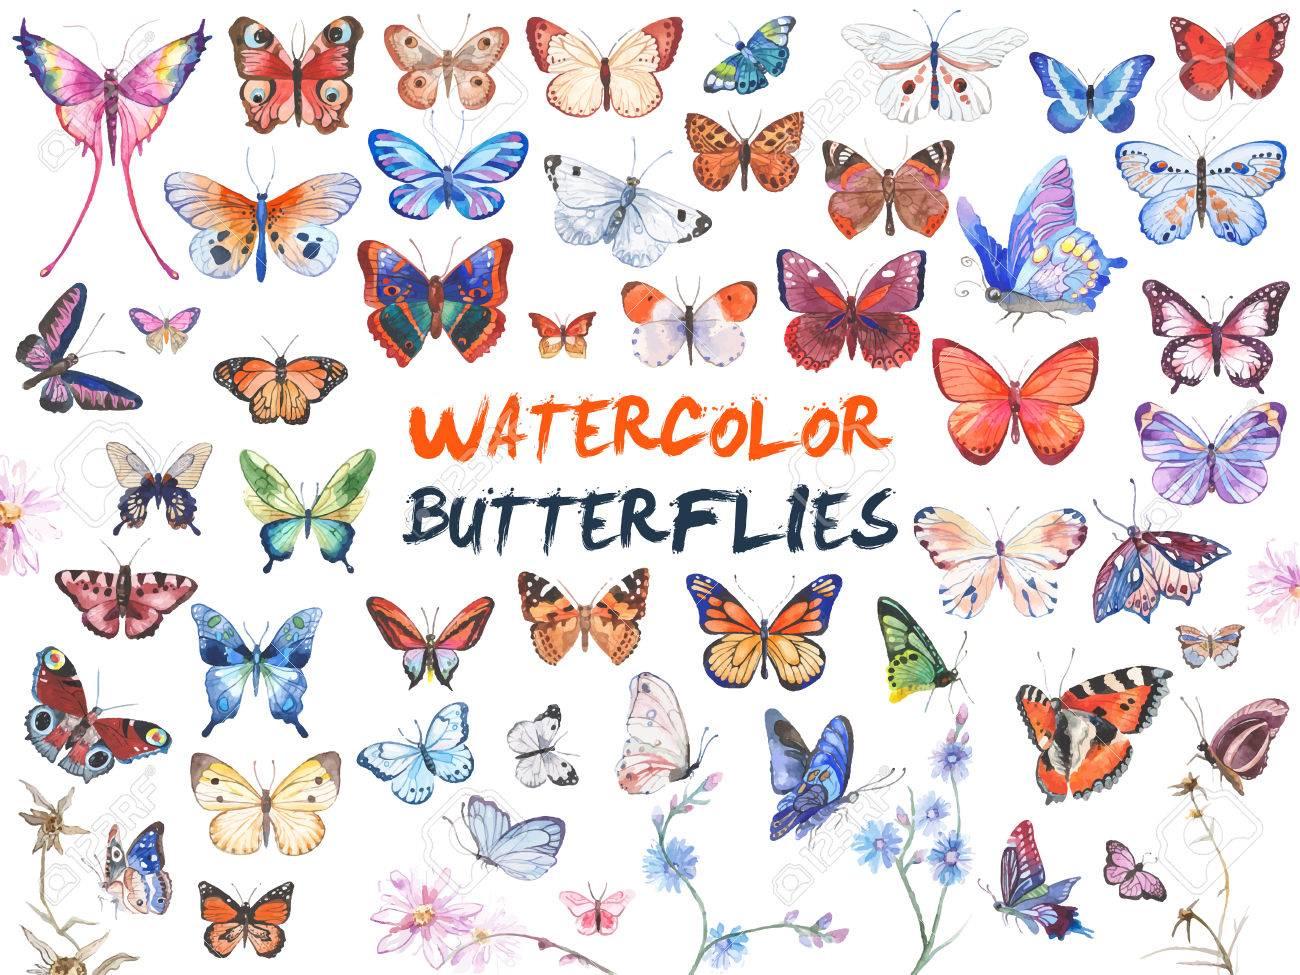 Watercolor butterflies illustration - 82678226